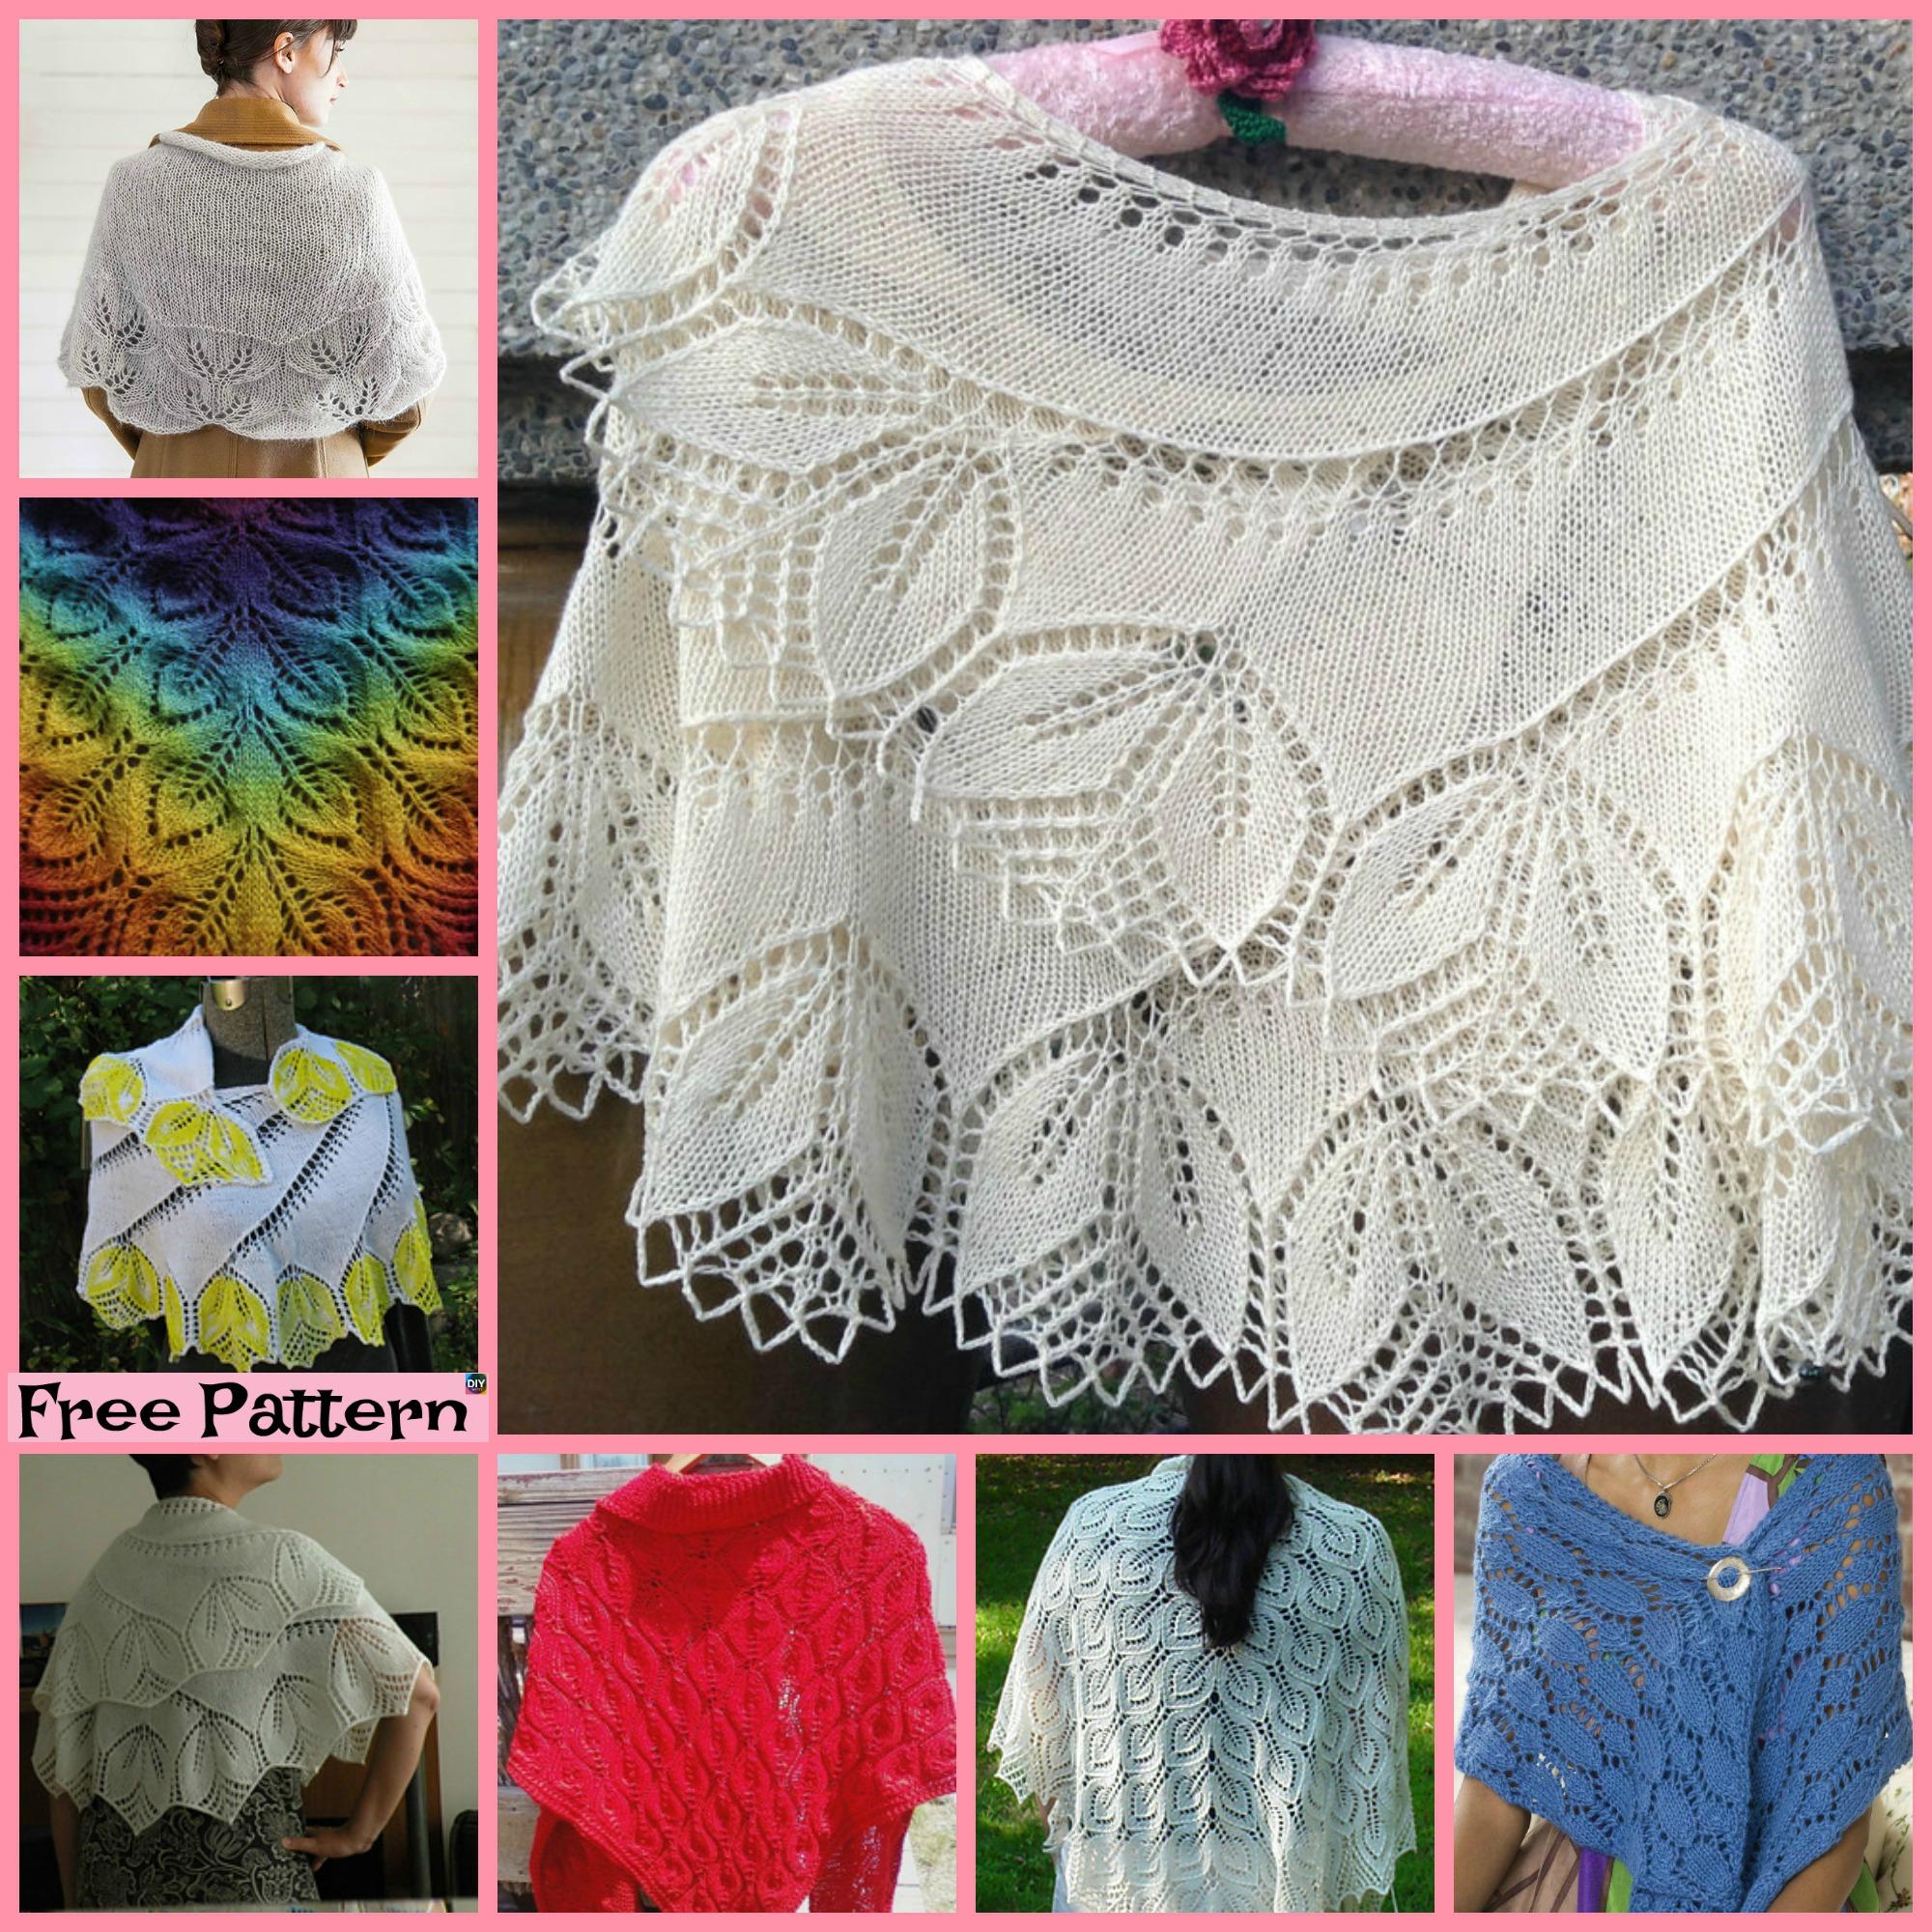 diy4ever-8 Pretty Knitting Lace Shawl Free Patterns